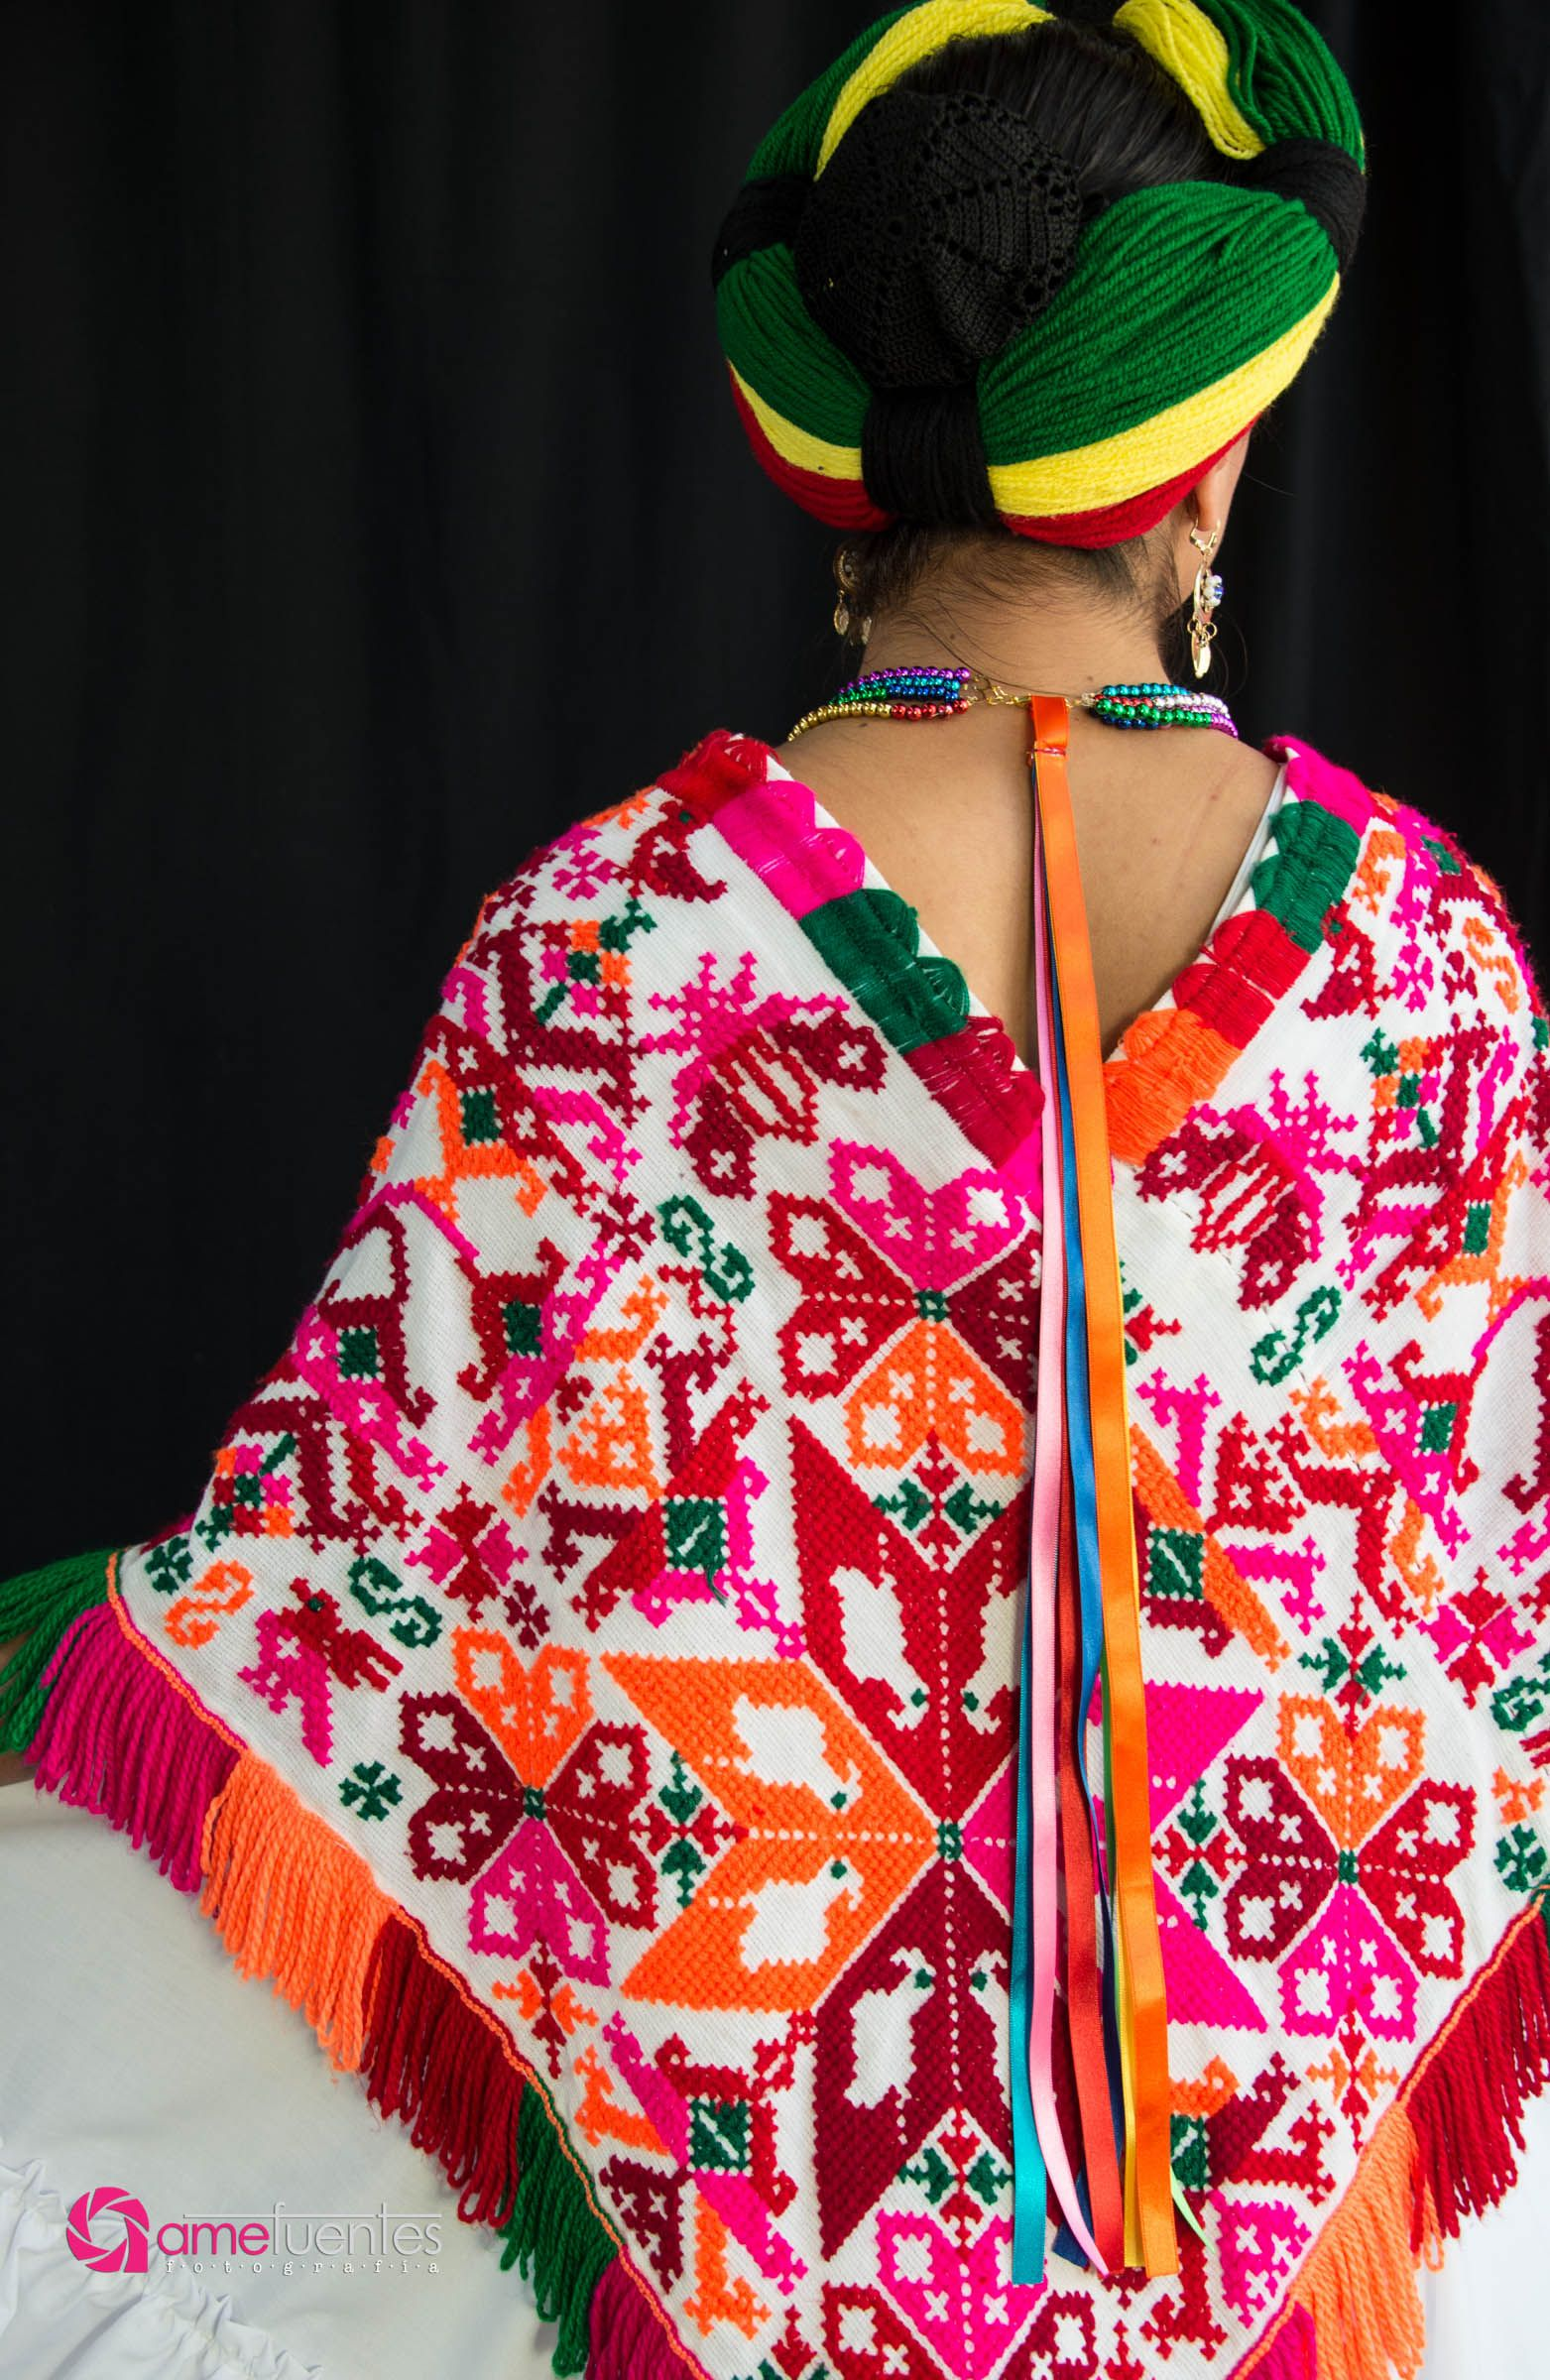 fbe7dd09fa2c3 Traje mujer Huasteca Potosina  artesaniasmexico Trajes Tipicos De Mexico